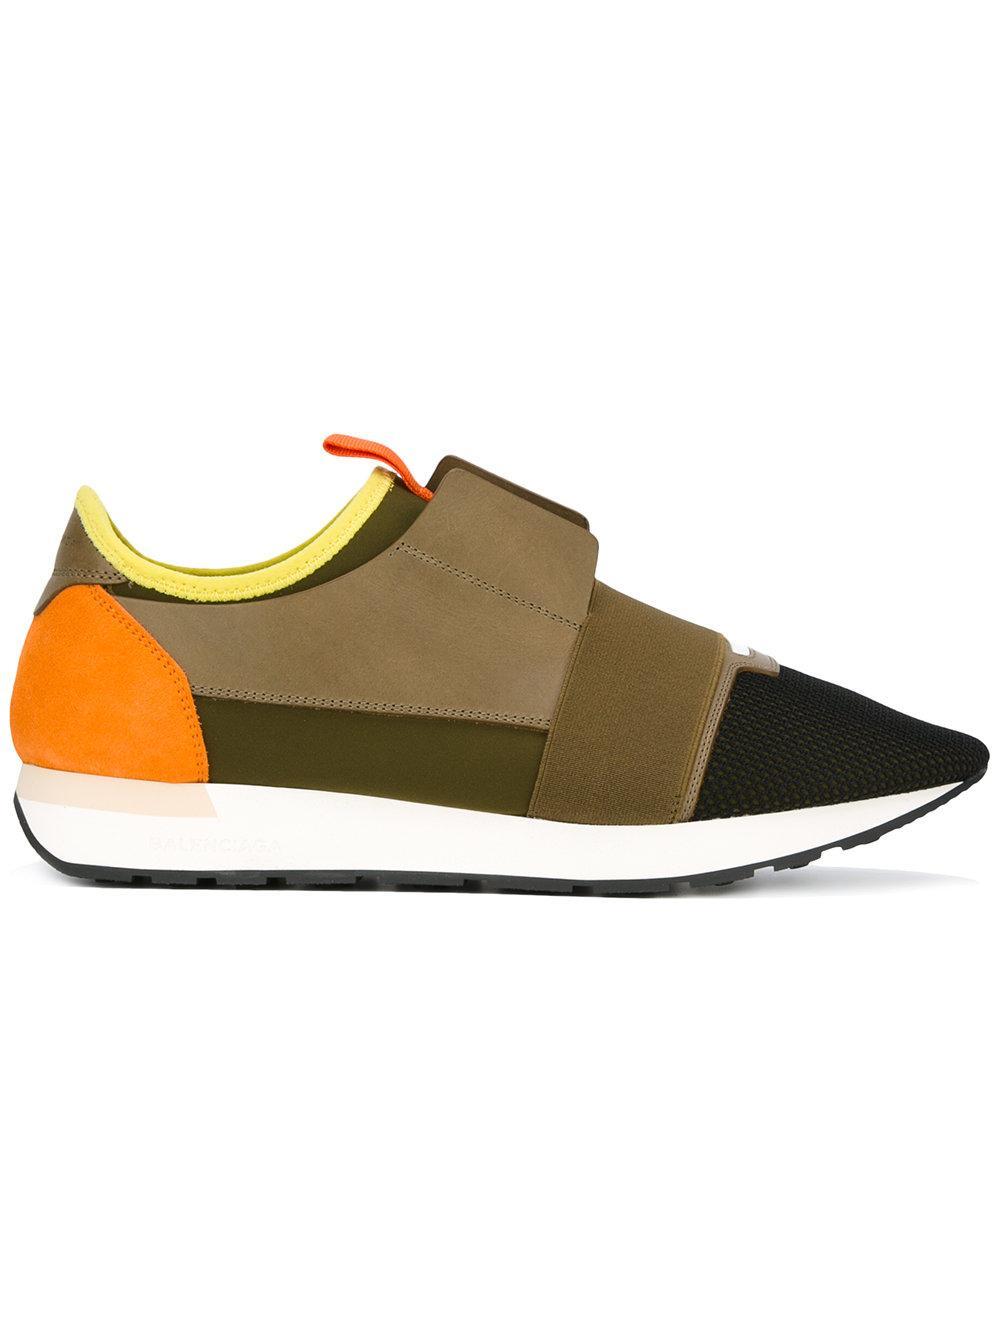 Balenciaga Colour Block Sneakers In Green For Men Lyst